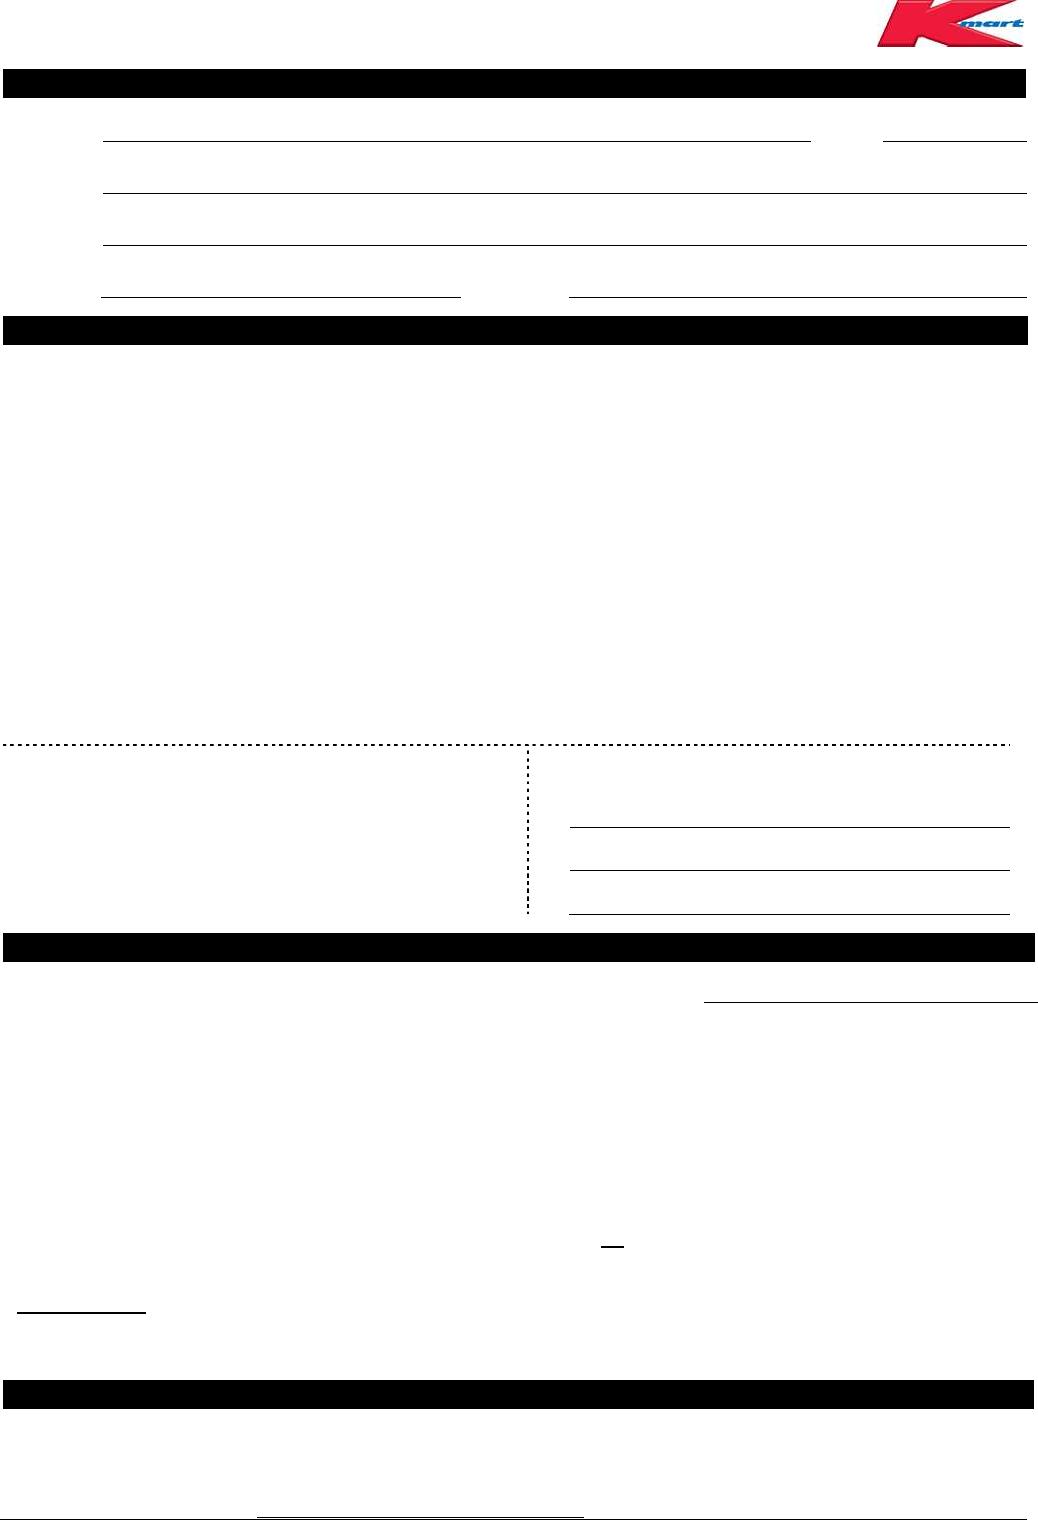 kmart australia job application form